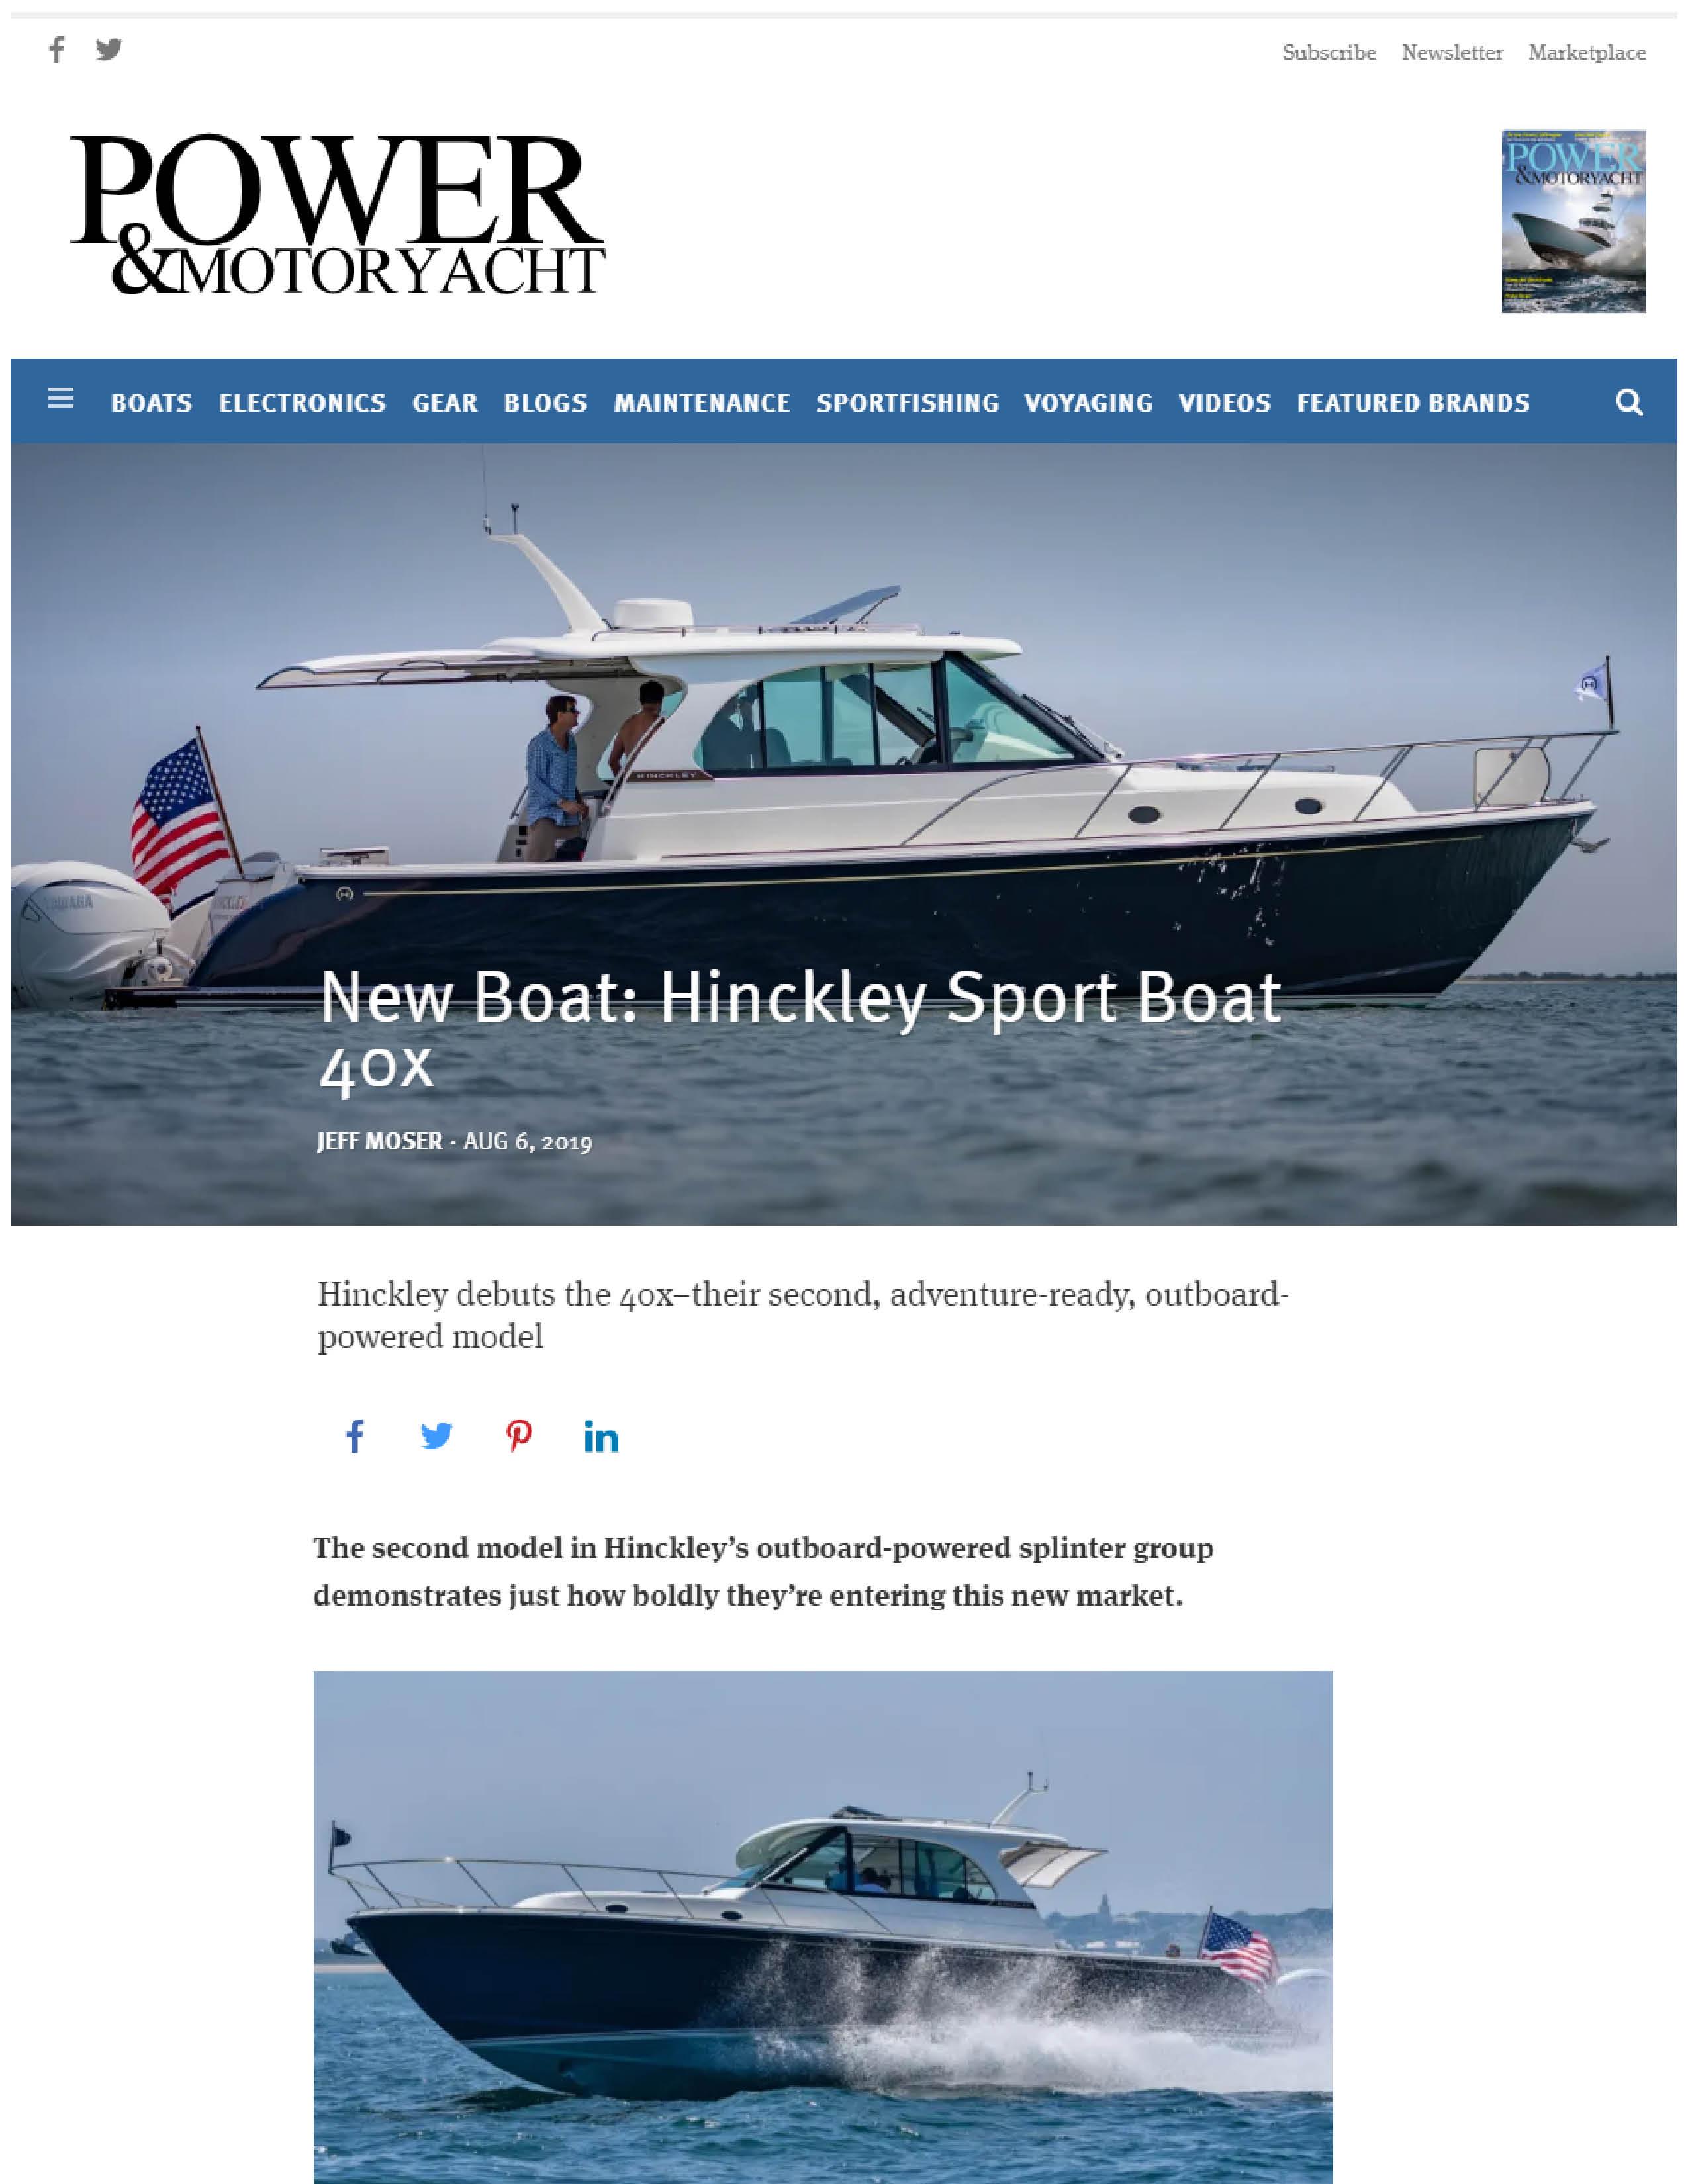 Hinckley Sport Boat 40x Featured in Power & Motoryacht